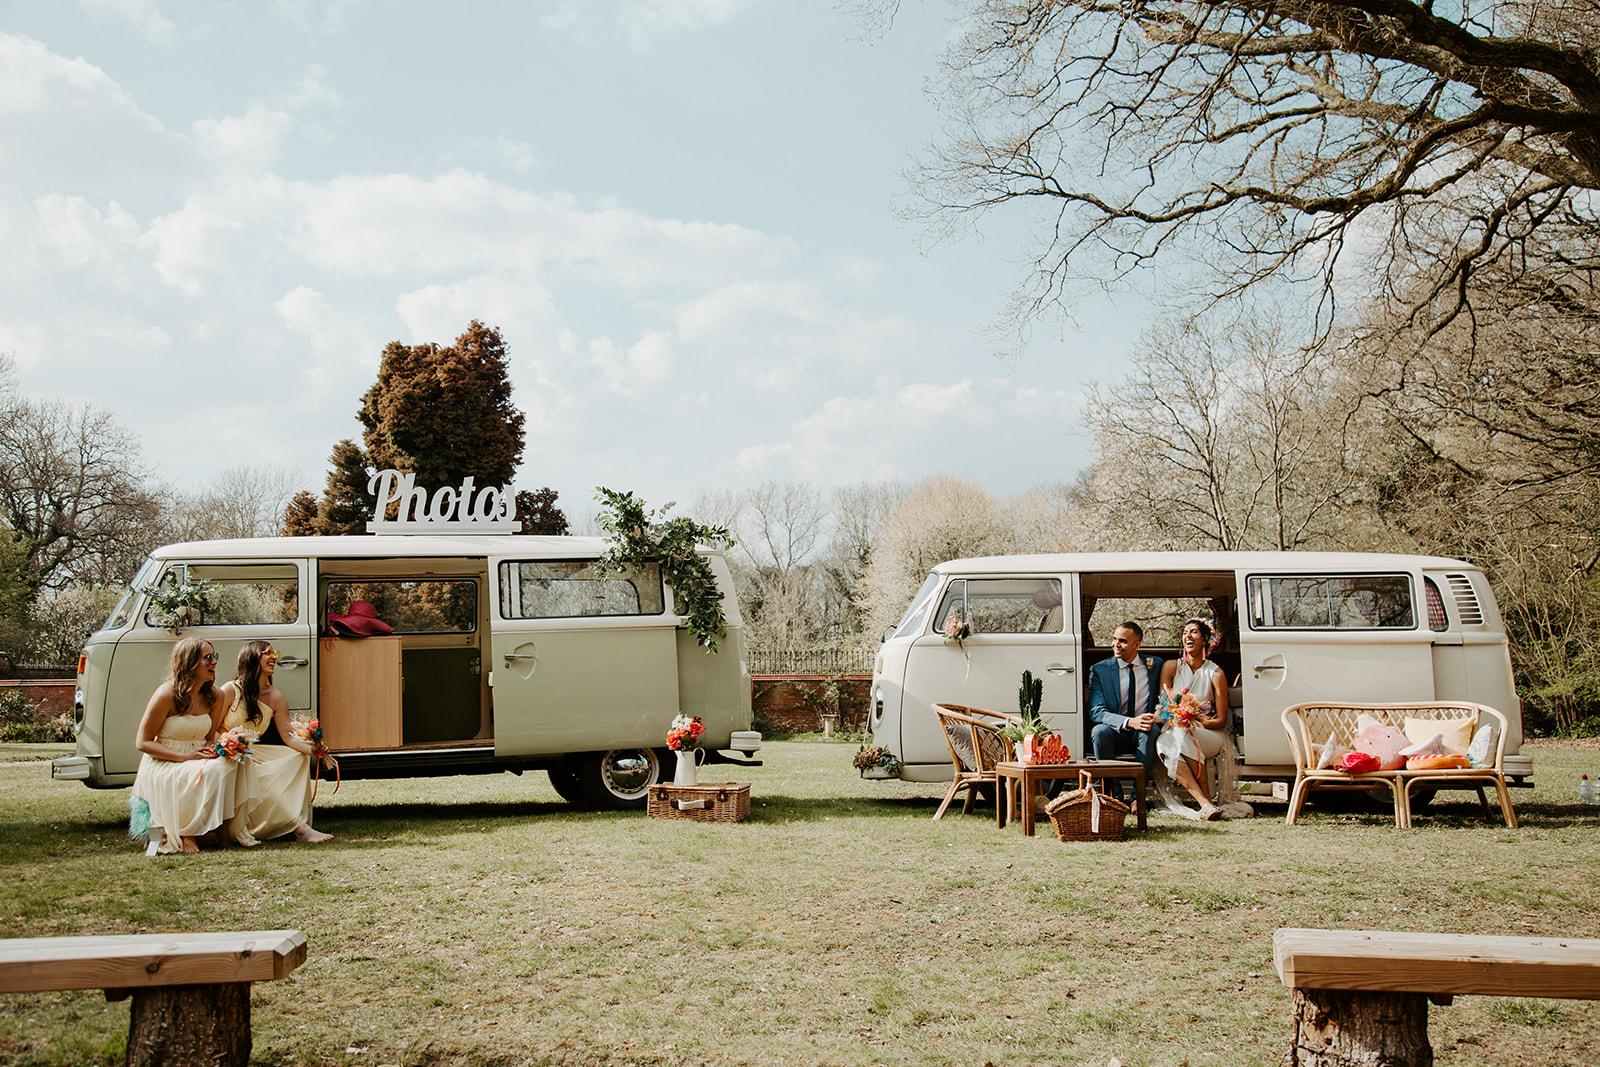 drive in wedding - camper van wedding - covid wedding - socially distanced wedding - small wedding ideas